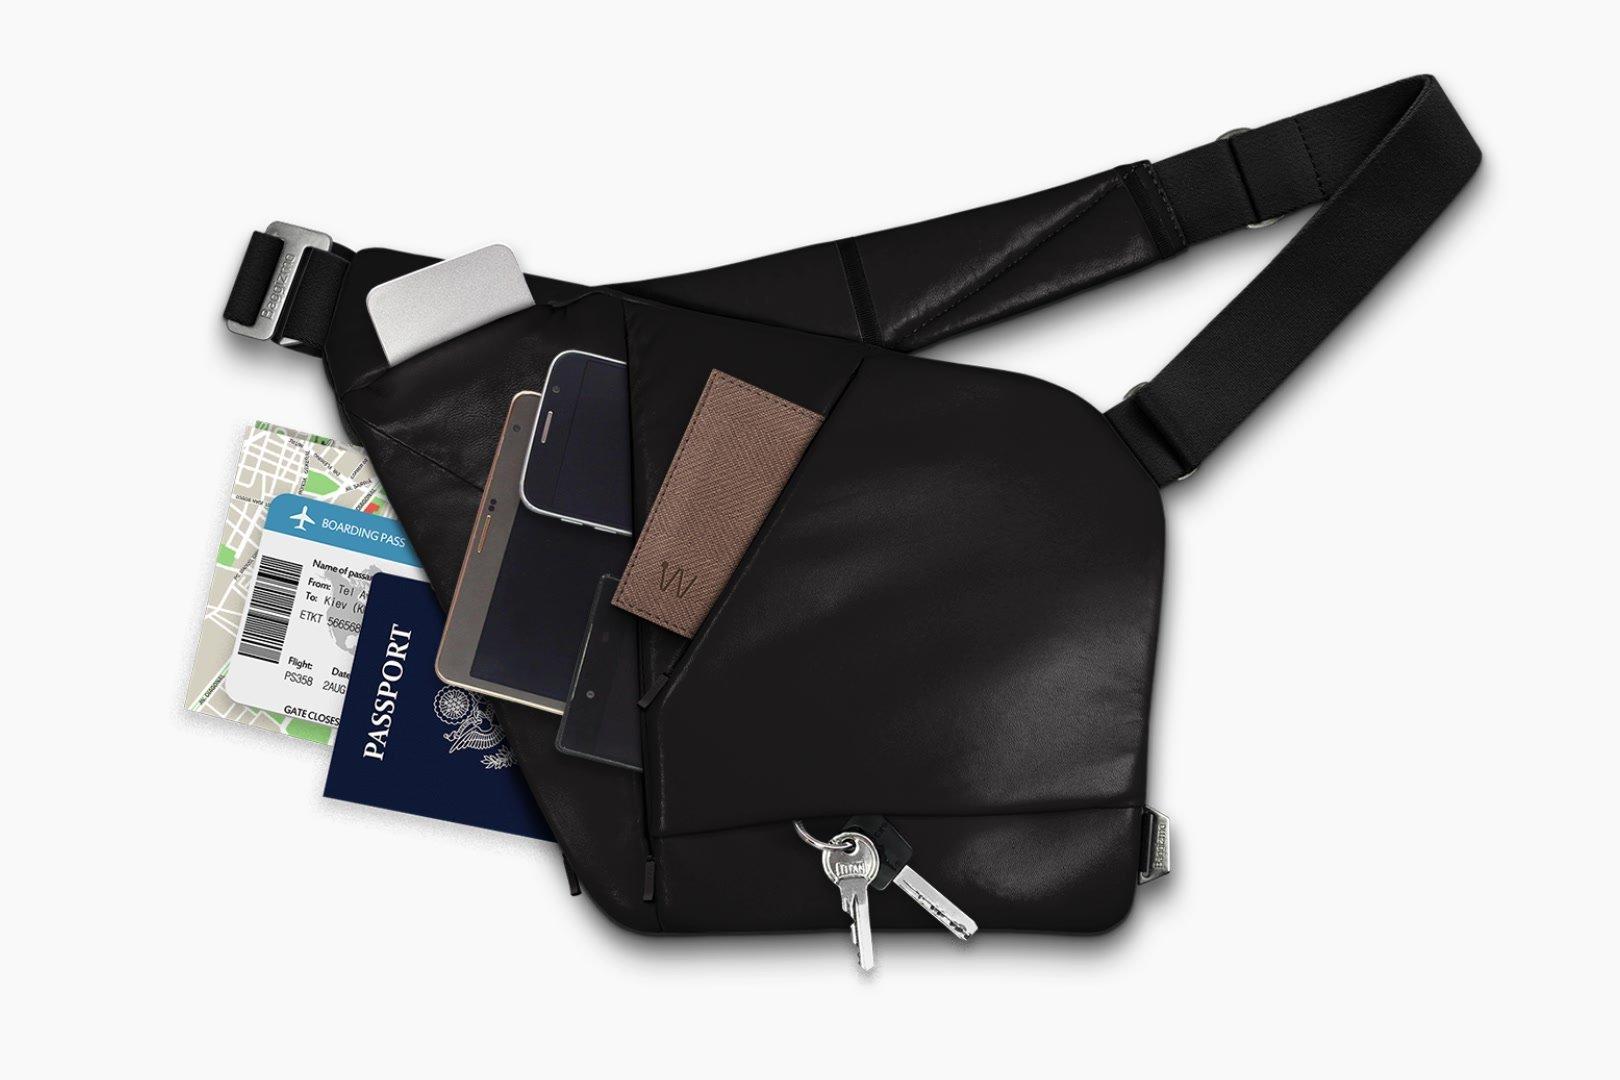 Black leather crossbody bag full of things, gadgets, passport, keys